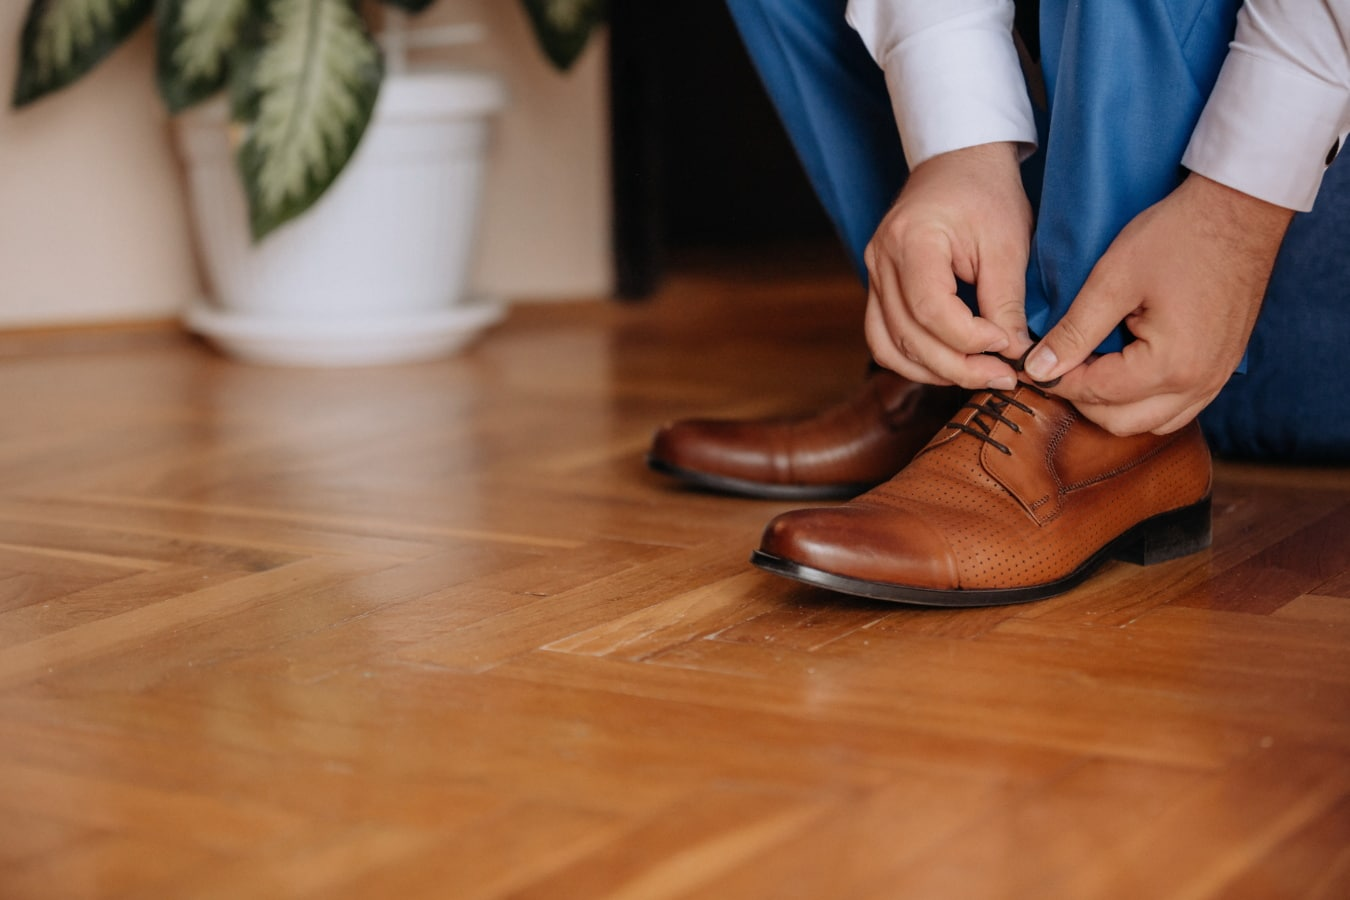 povremeni, cipele, smeđa, koža, čovjek, ruke, vezica, noge, parket, kat